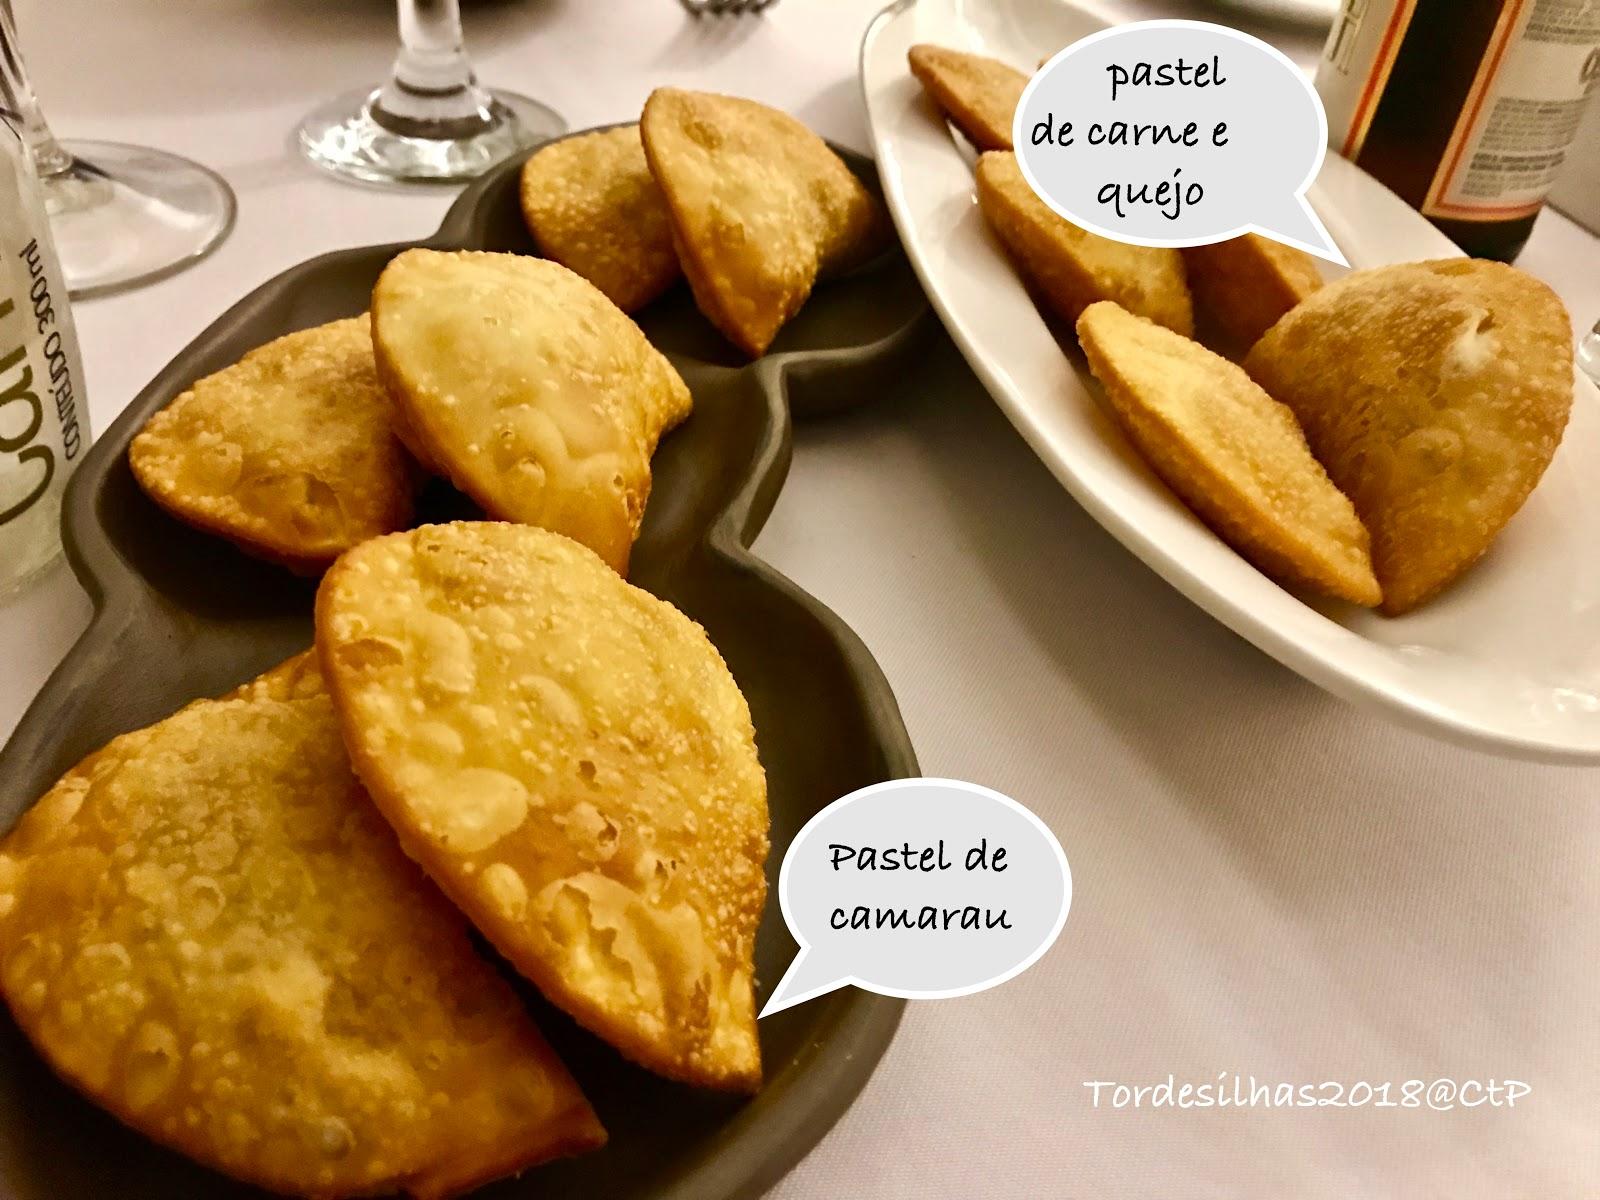 Ristorante Tordesilhas - Cucina Brasiliana alessandra ruggeri pastel de carne e queijo